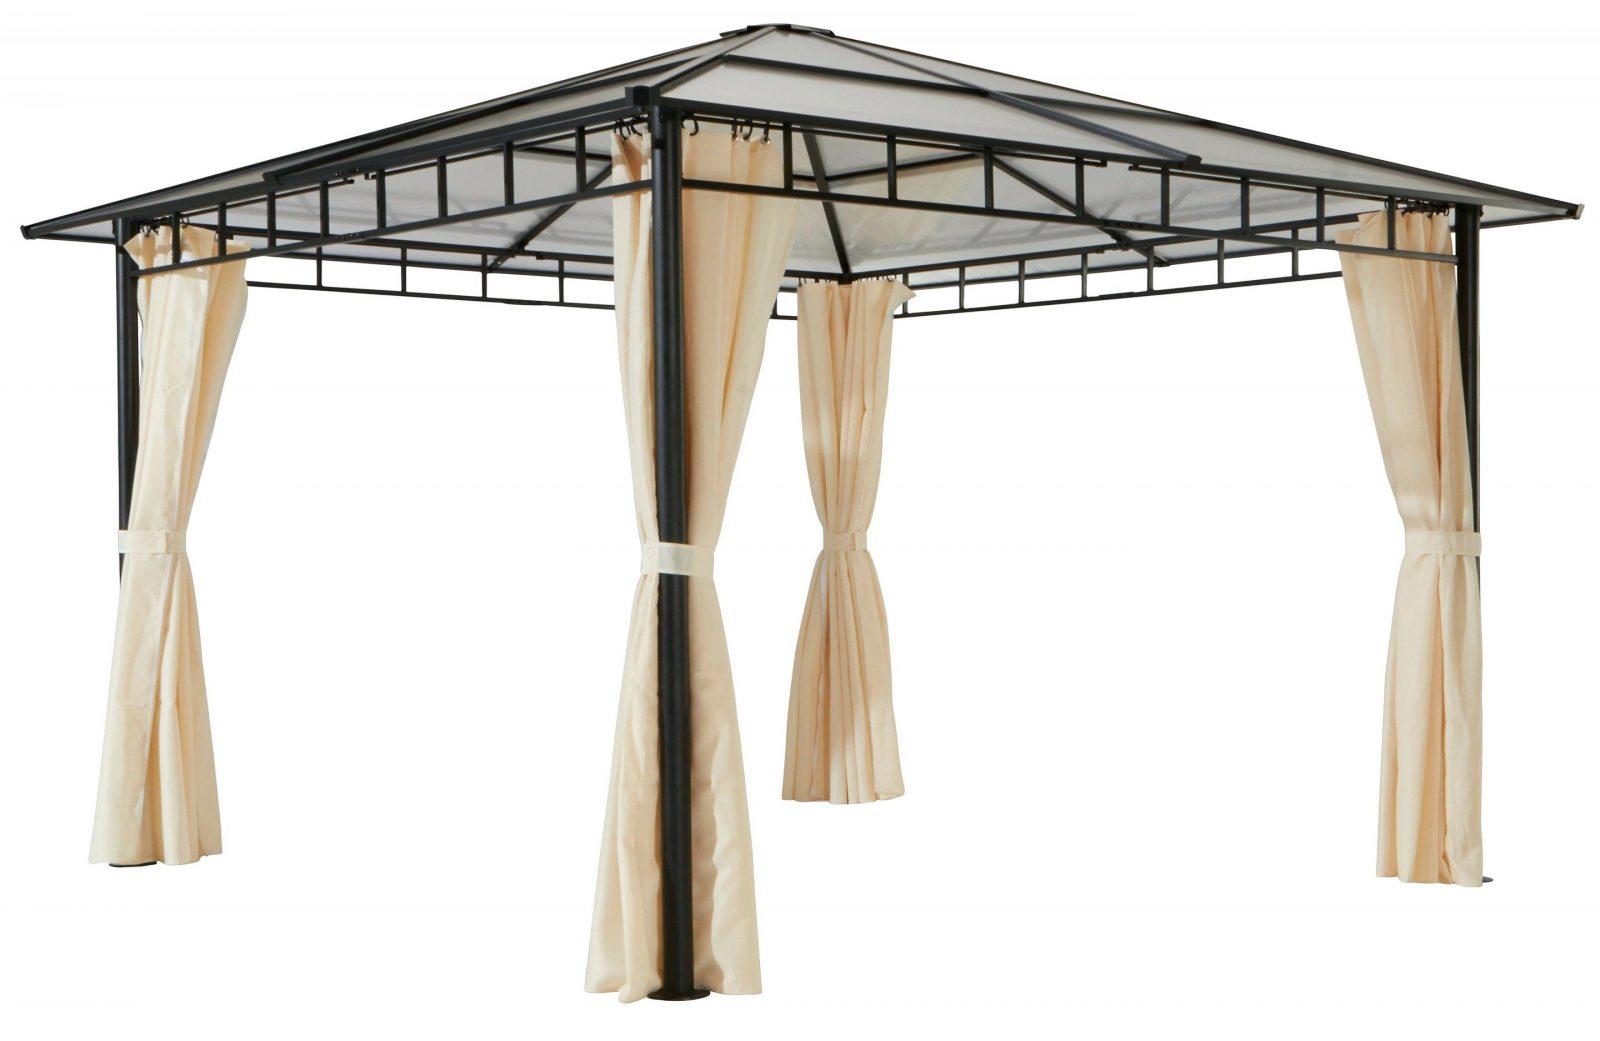 Tolle Interessante Decoratie Pavillons 3×3 Klapp Pavillon von Pavillon Dach 3X3M Wasserdicht Ersatzdach Bild